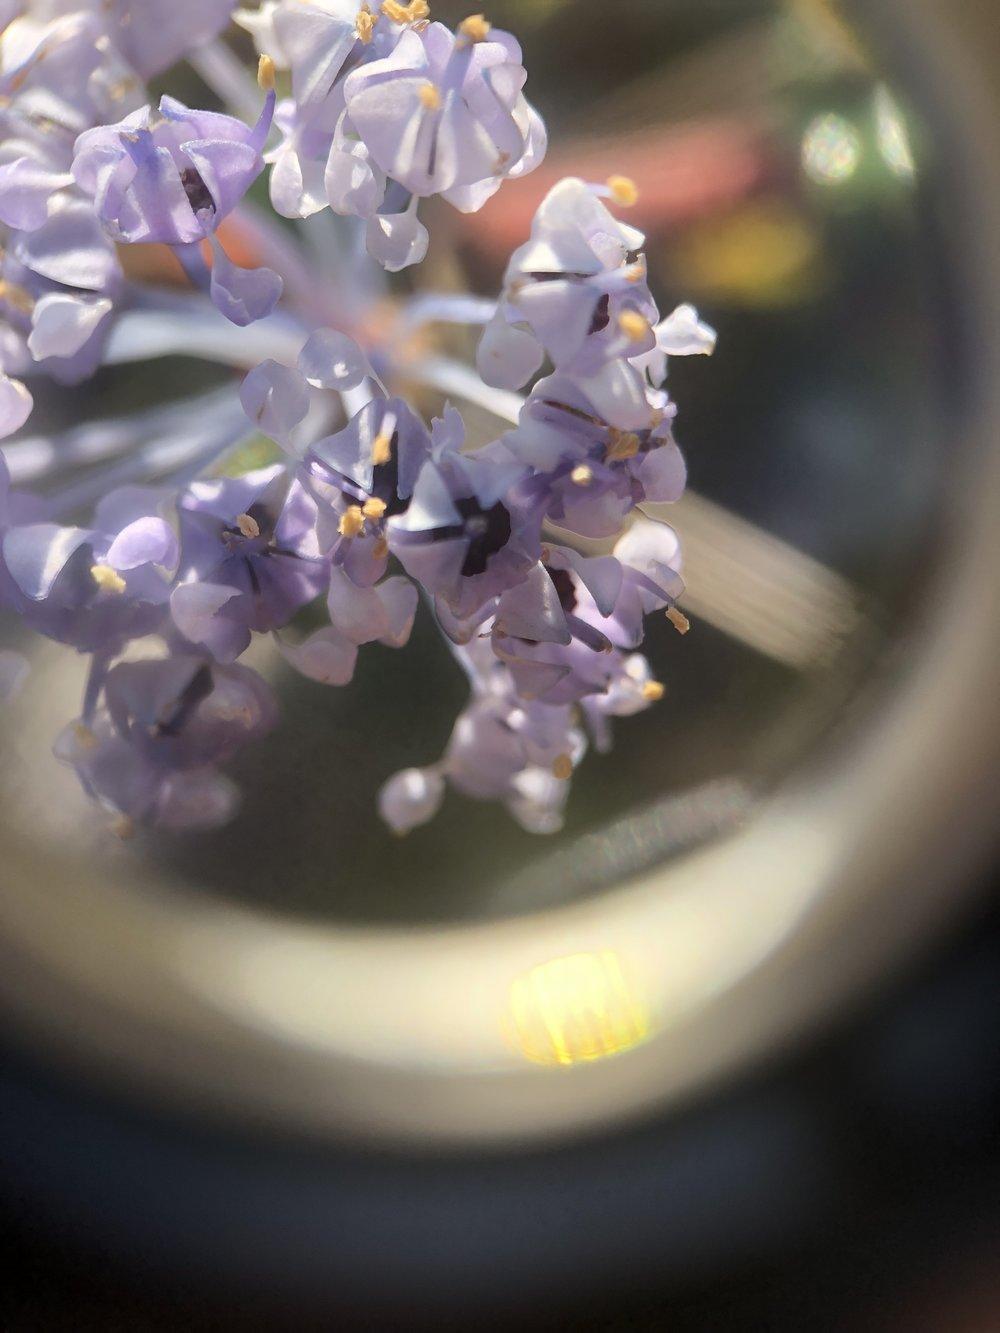 Ceanothus spp. flowers through a loupe up close!. Taken Spring 2019 - Salt Point State Park.